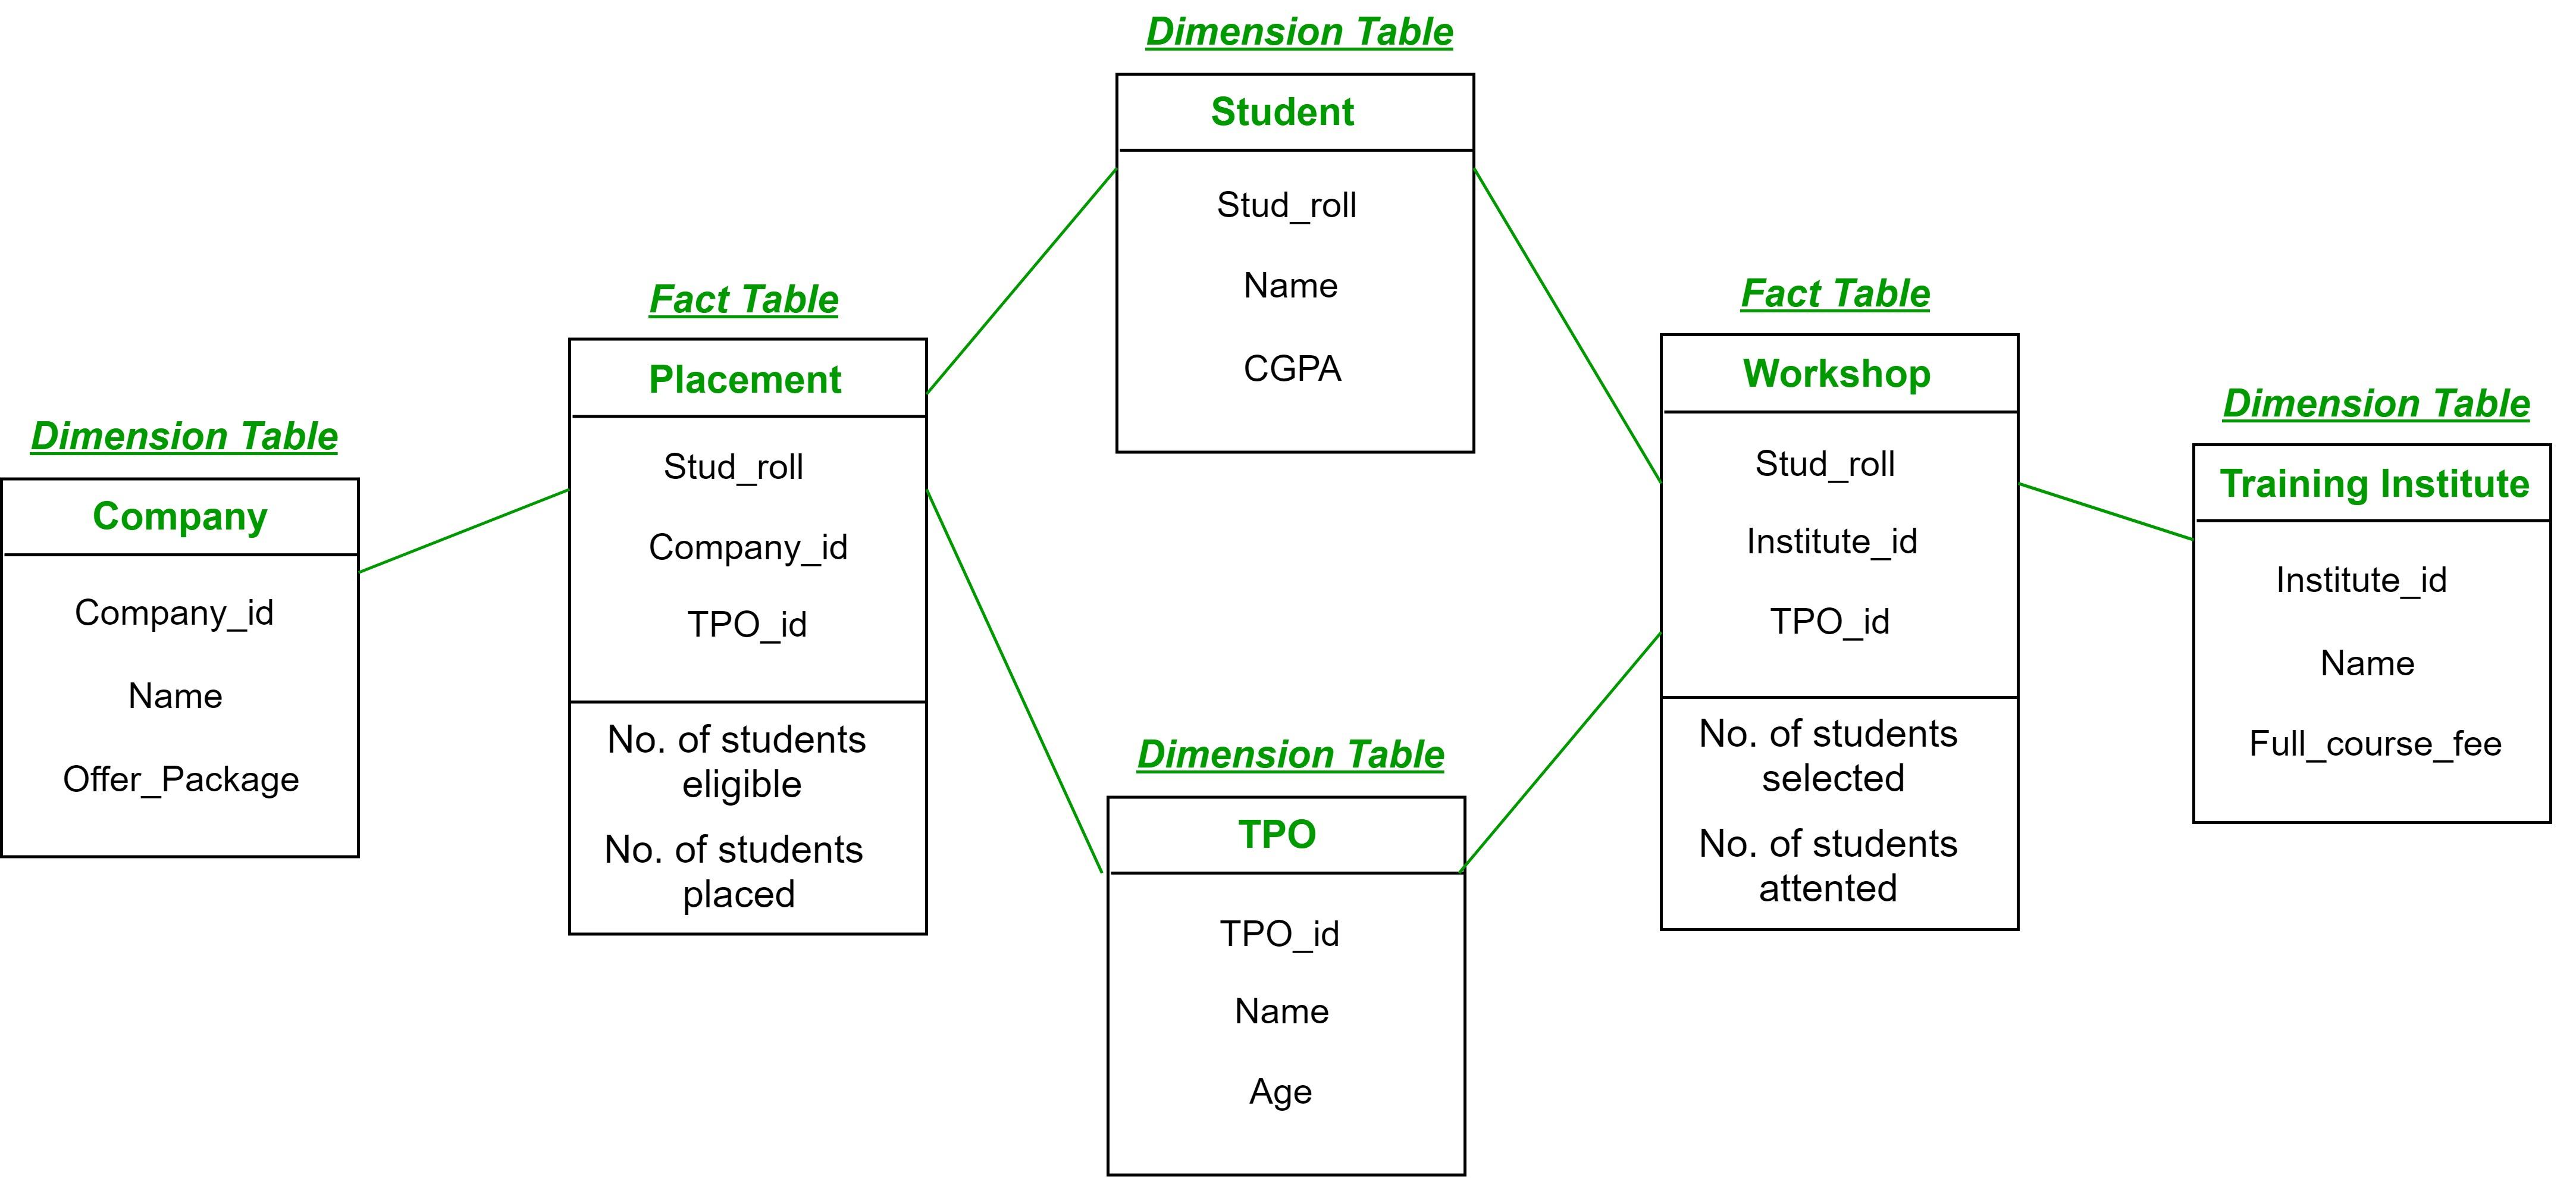 Fact Constellation In Data Warehouse Modelling - Geeksforgeeks regarding Er Diagram Guru99